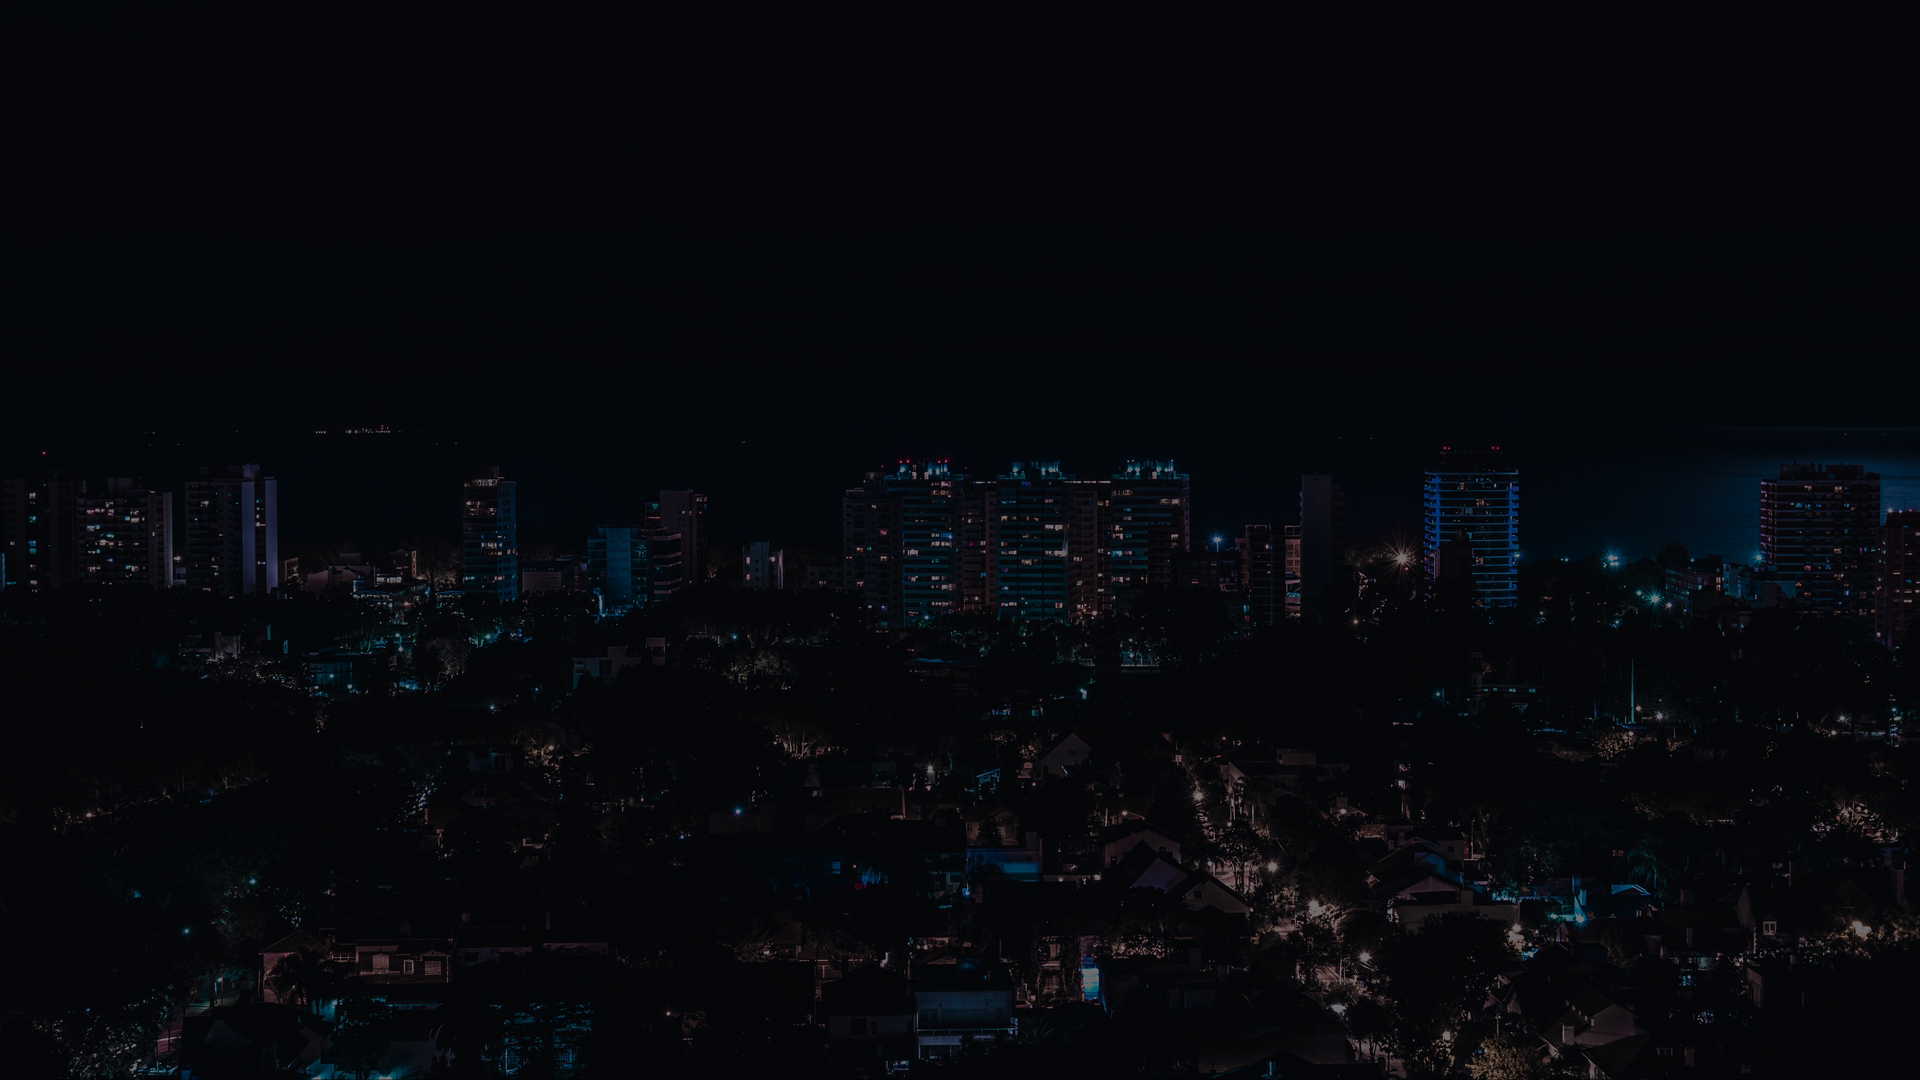 /var/www/html/wp-content/uploads/2018/09/olivos_argentina_night_city_buildings_city_lights_119865_1920x1080